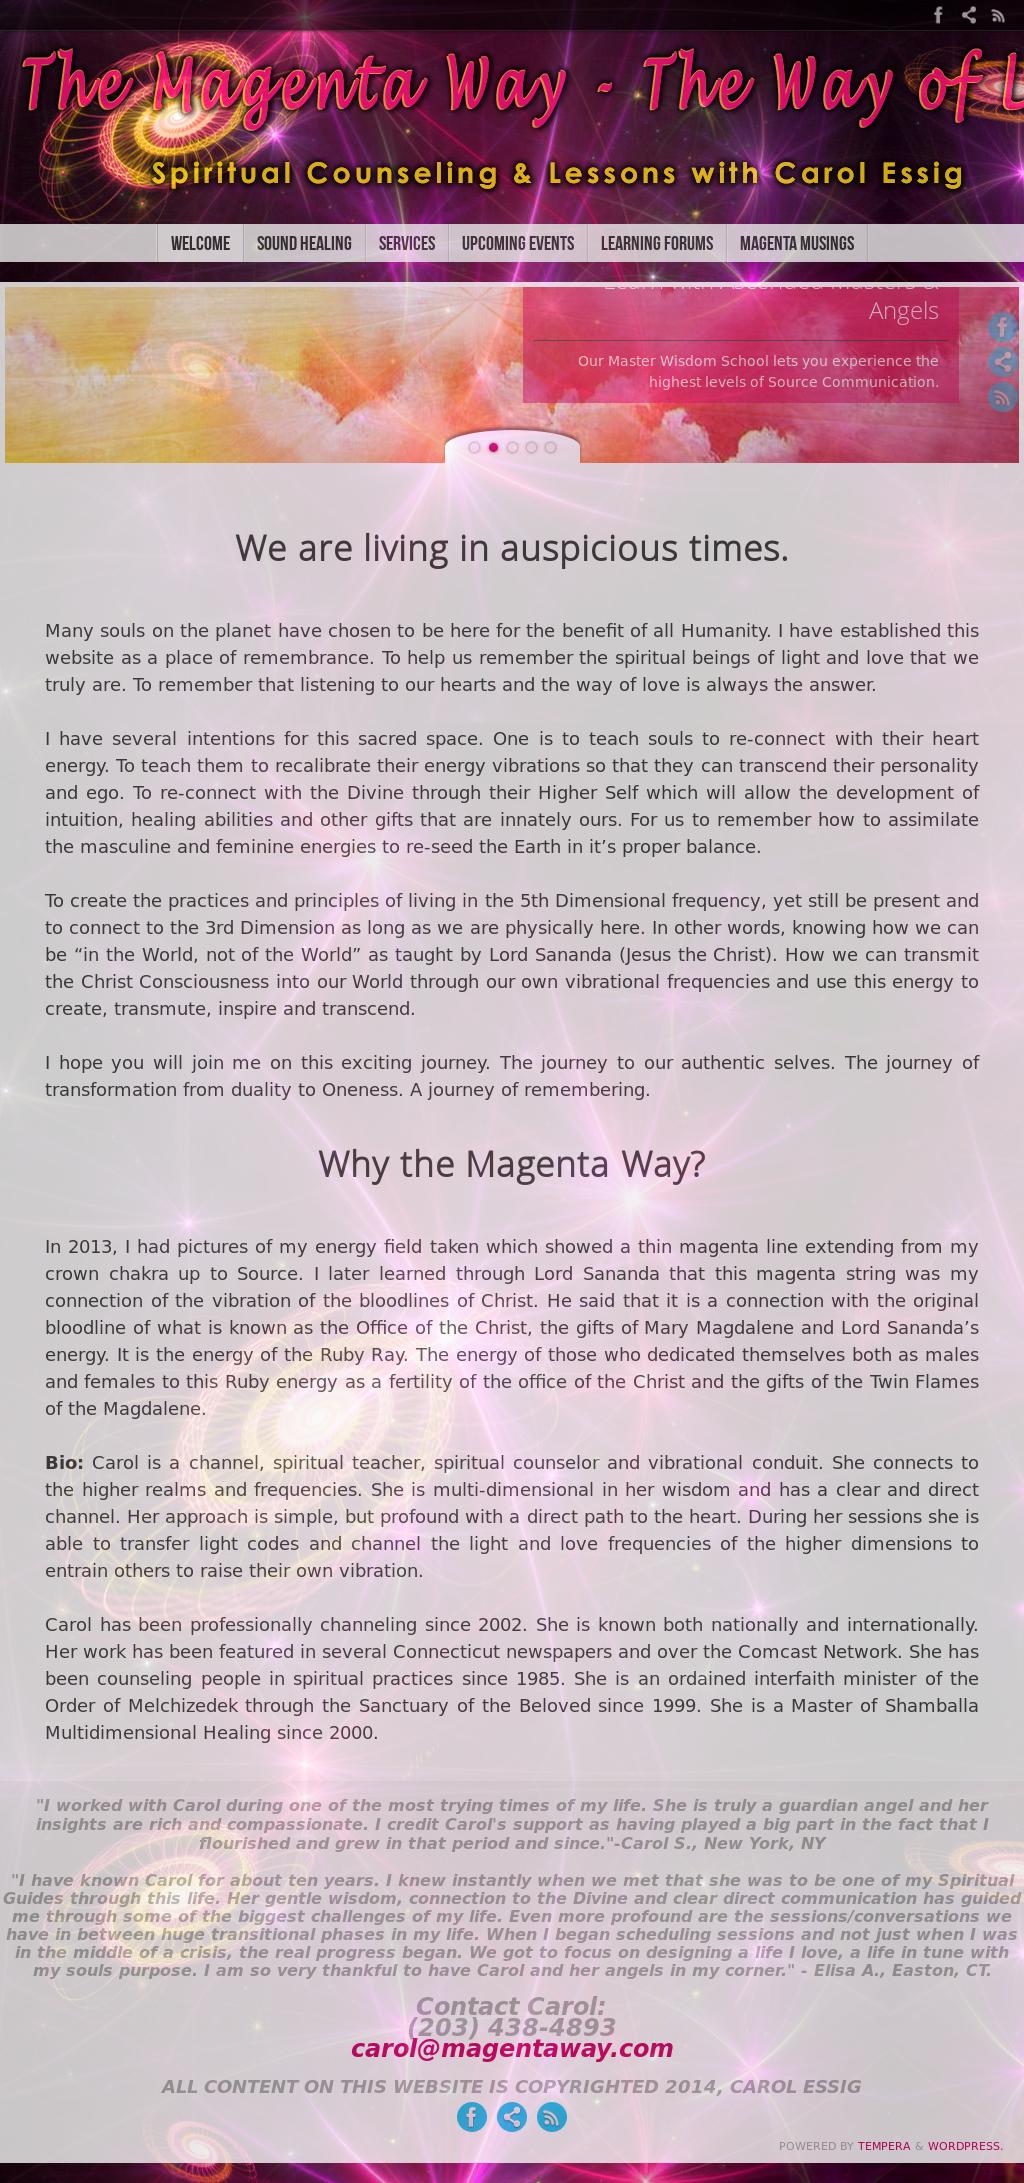 The Magenta Way With Carol Essig Competitors, Revenue and